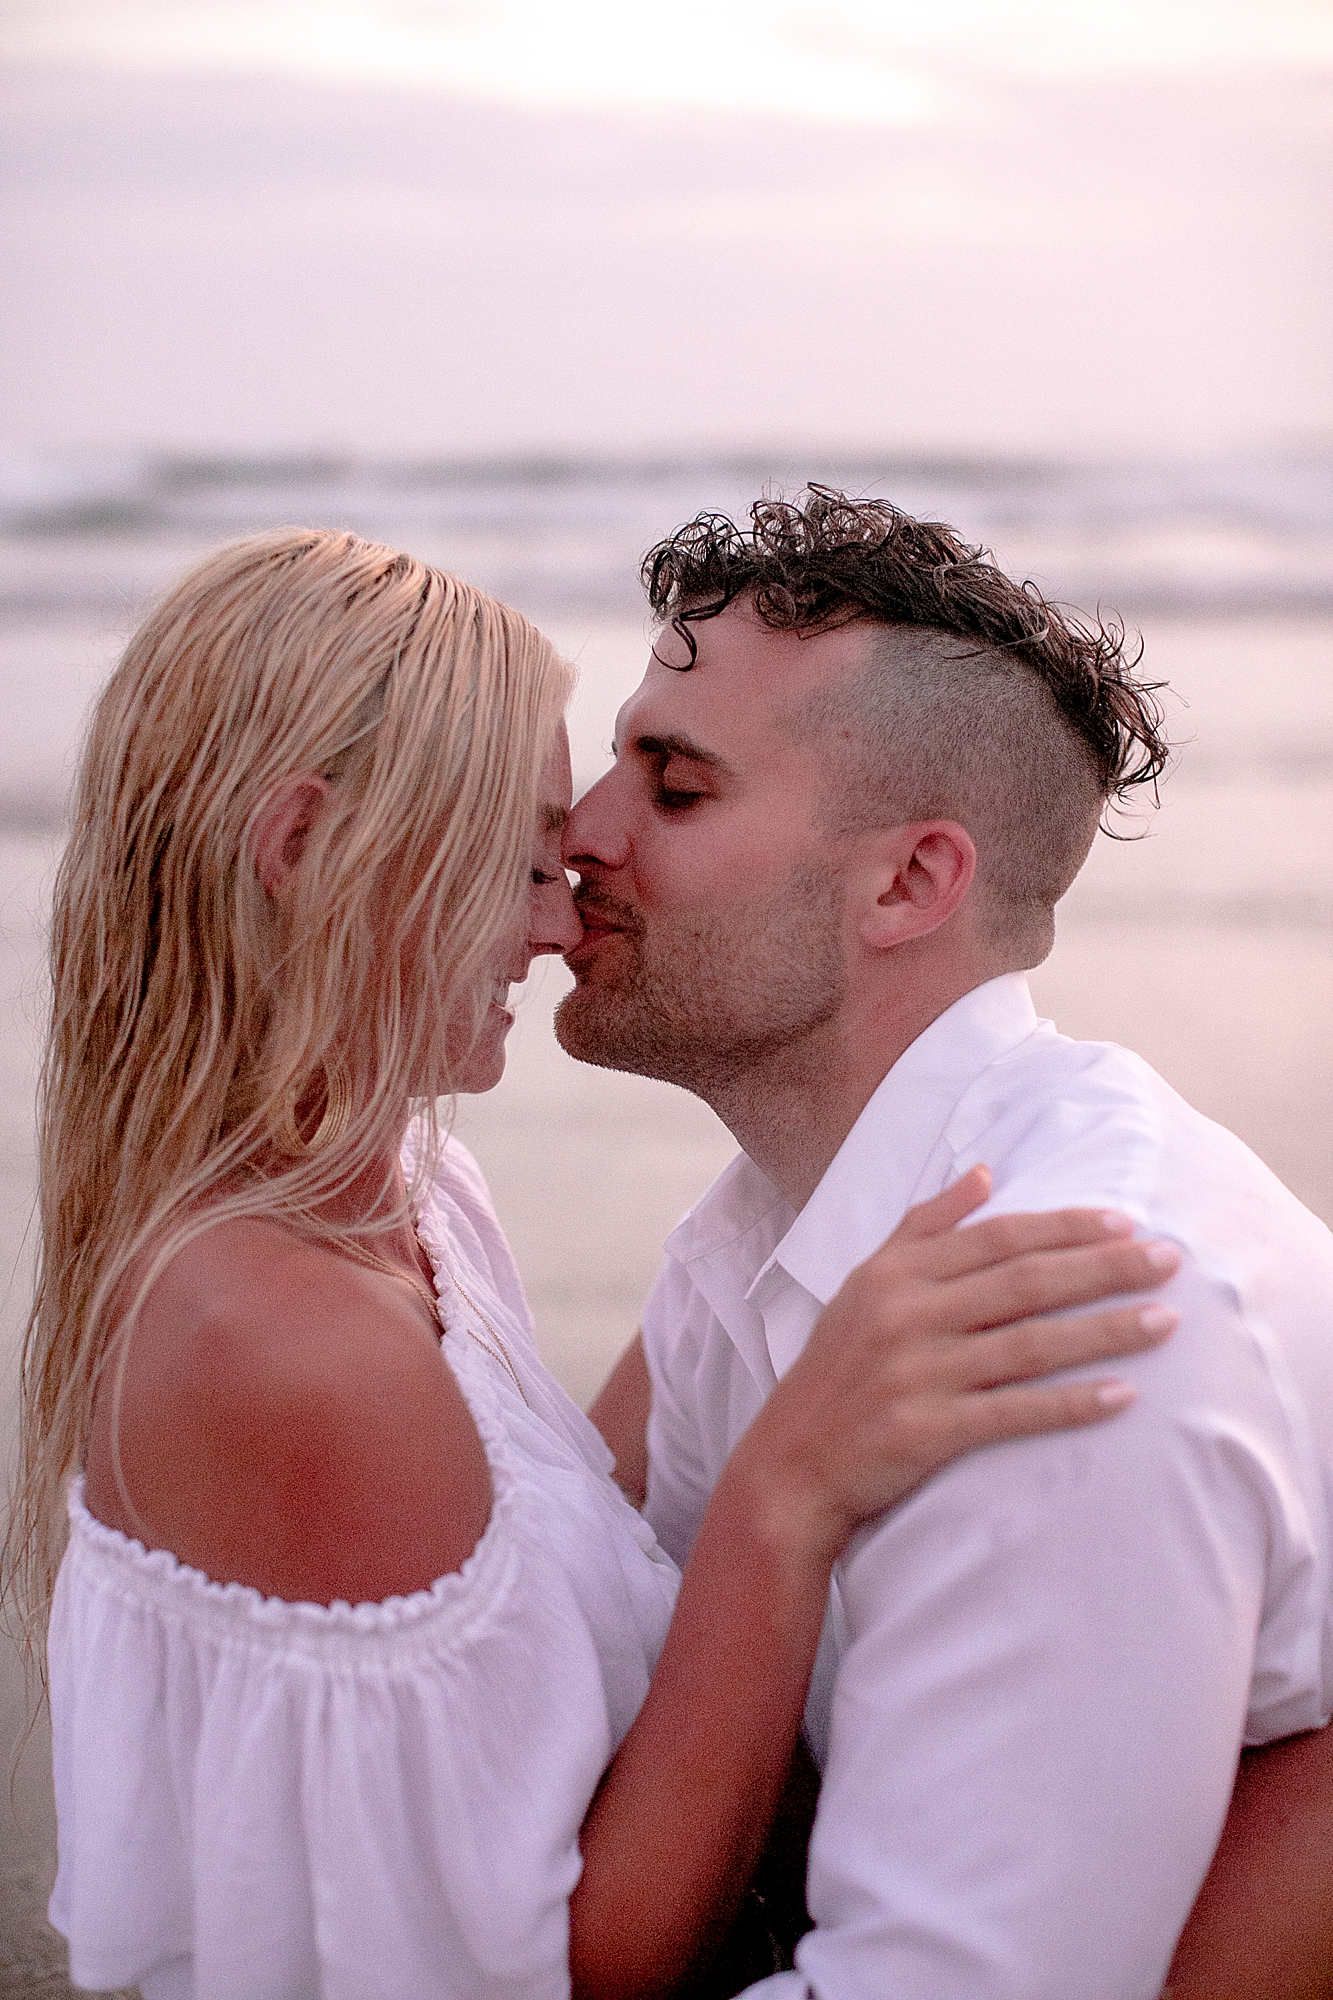 Epic and Adventurous Travel Wedding and Portrait Photographer in Nosara, Costa Rica - Kelee Bovelle @xokelee @keleeb - 31.jpg